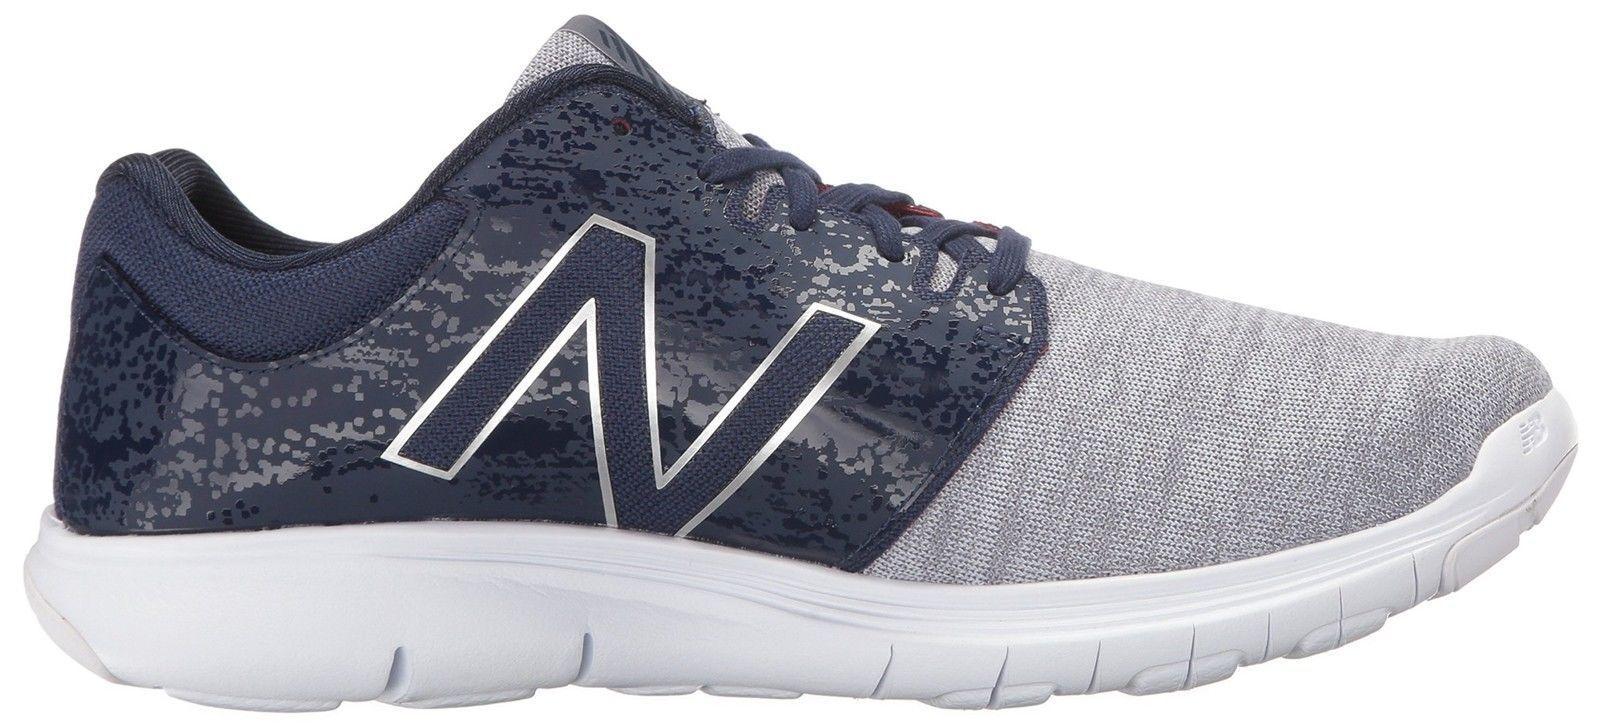 New Balance Men's M530V2 Running shoes Grey Navy SIZE 10  US M530RN2